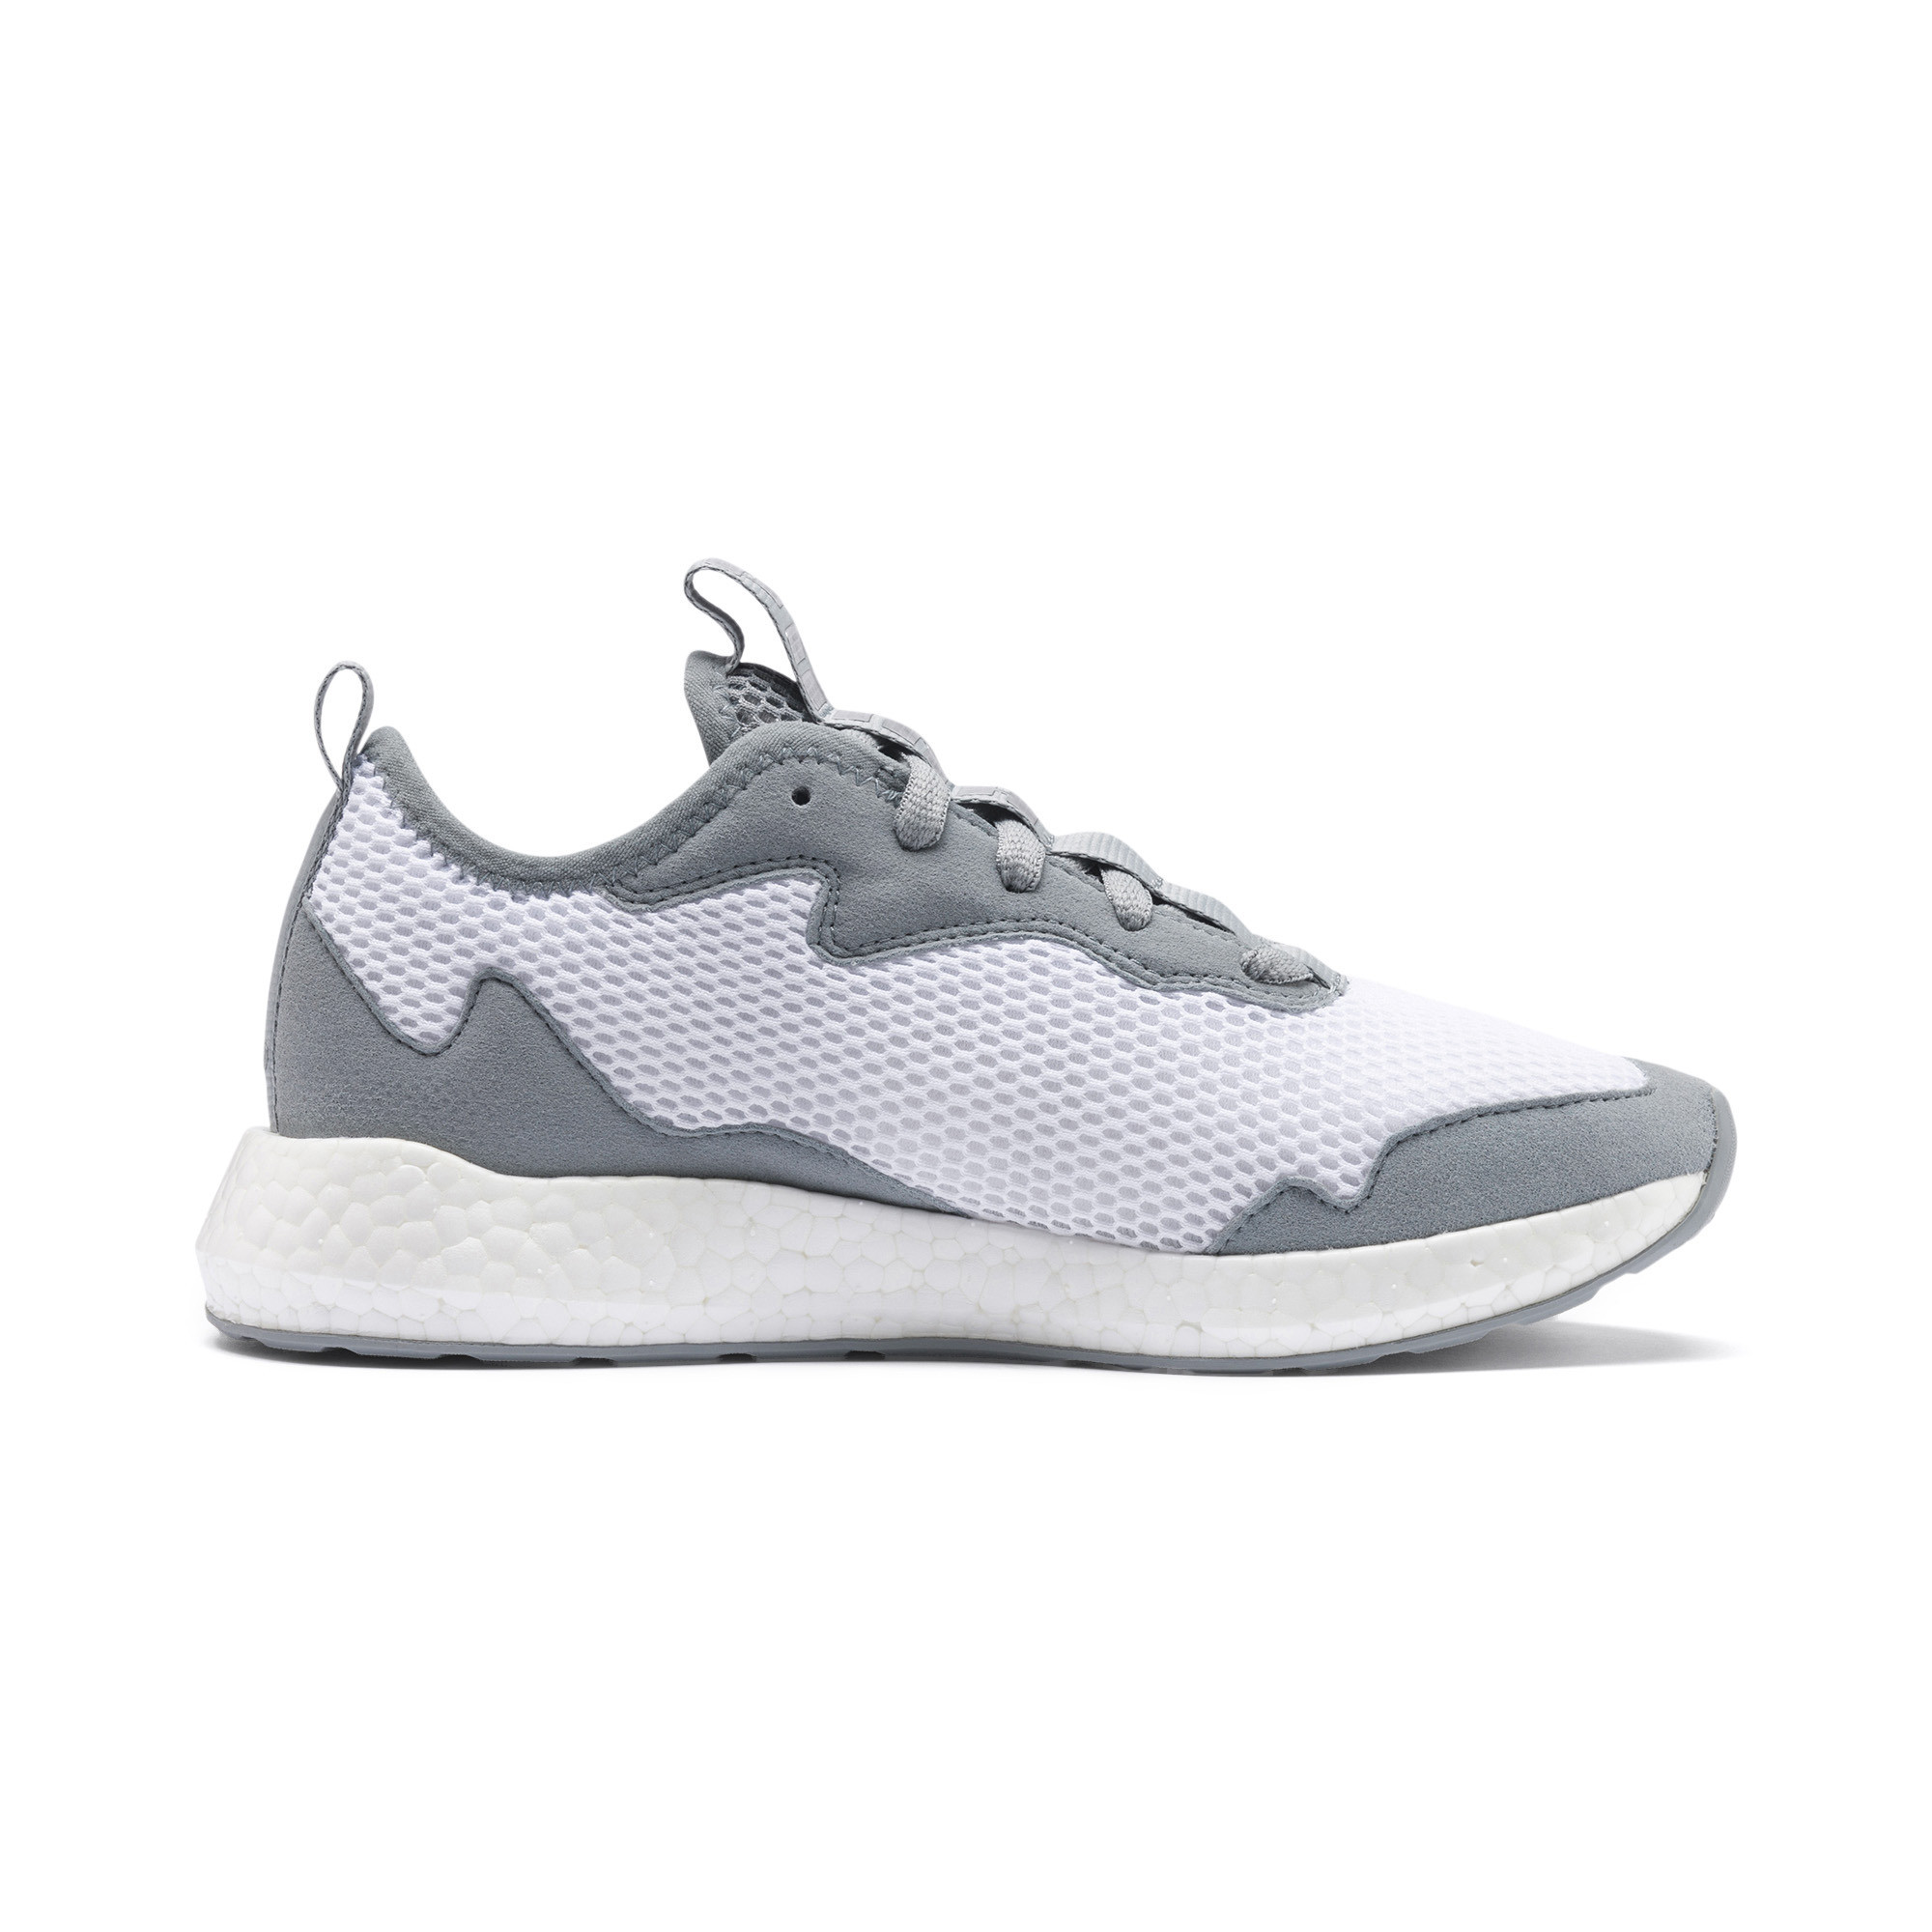 PUMA-Women-039-s-NRGY-Neko-Skim-Running-Shoes thumbnail 7